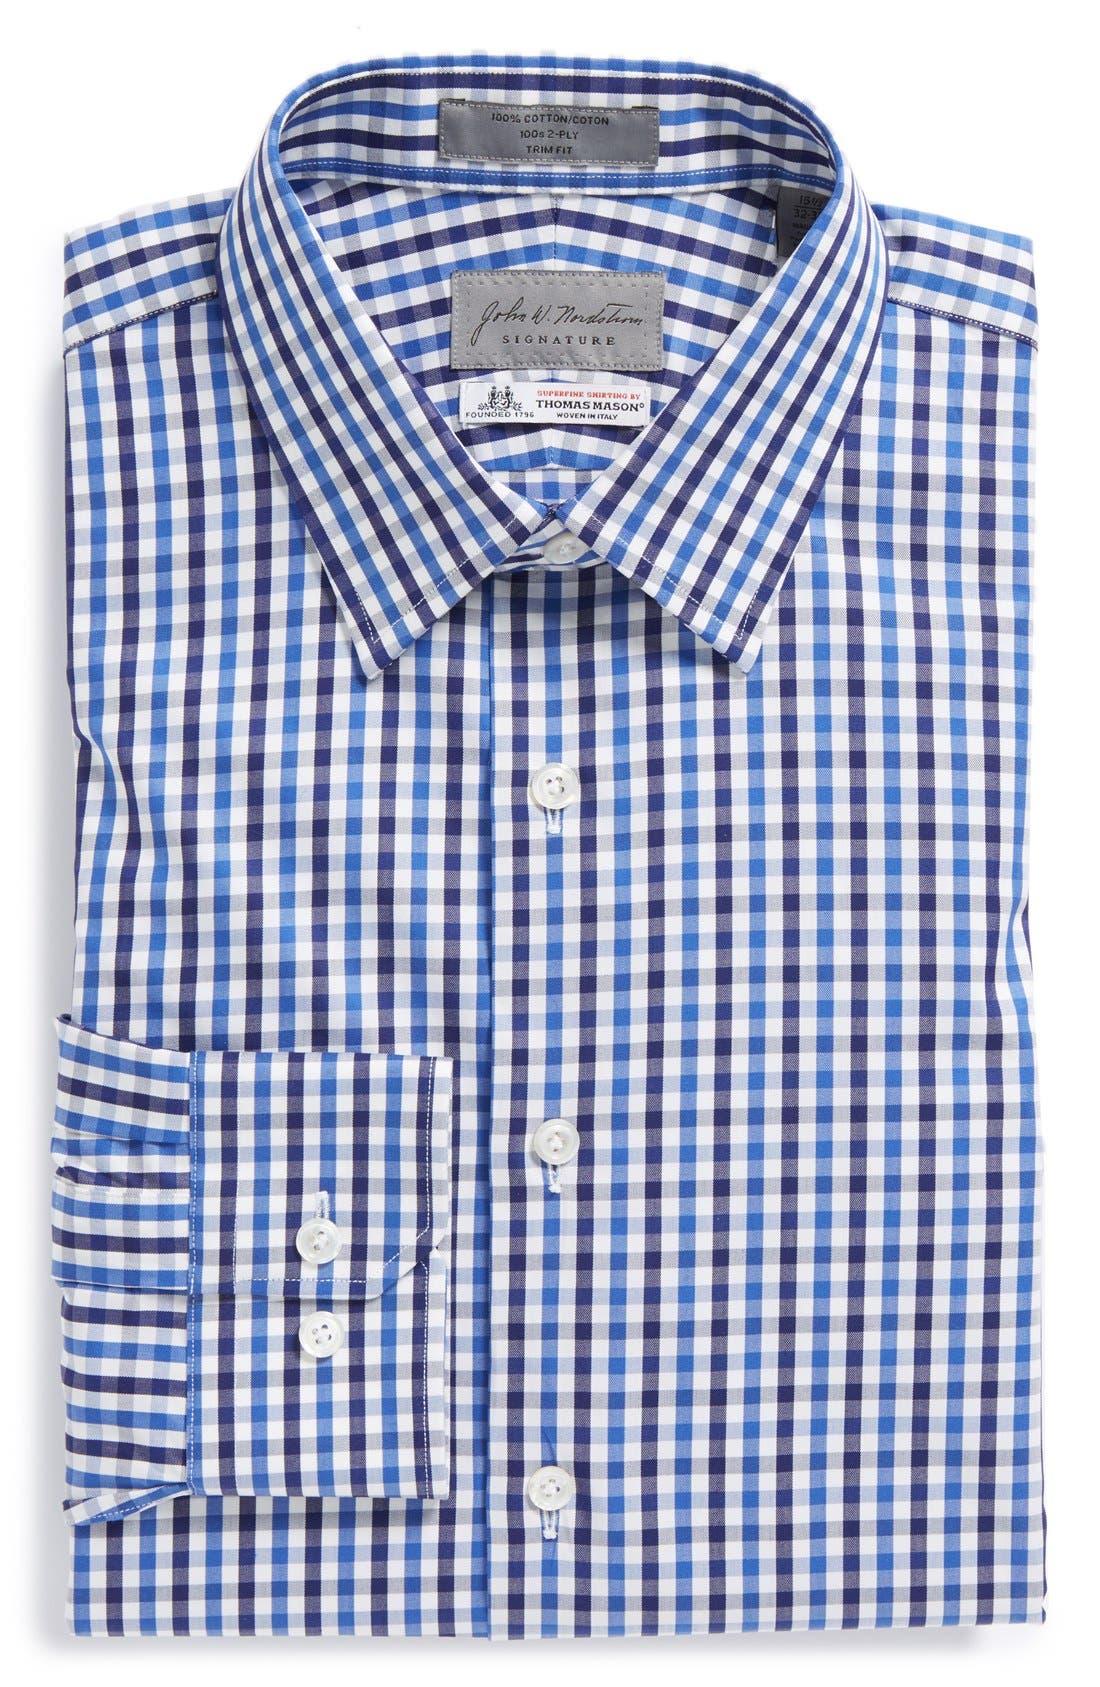 John W Nordstrom<sup>®</sup> Signature Trim Fit Check Dress Shirt, Main, color, 401